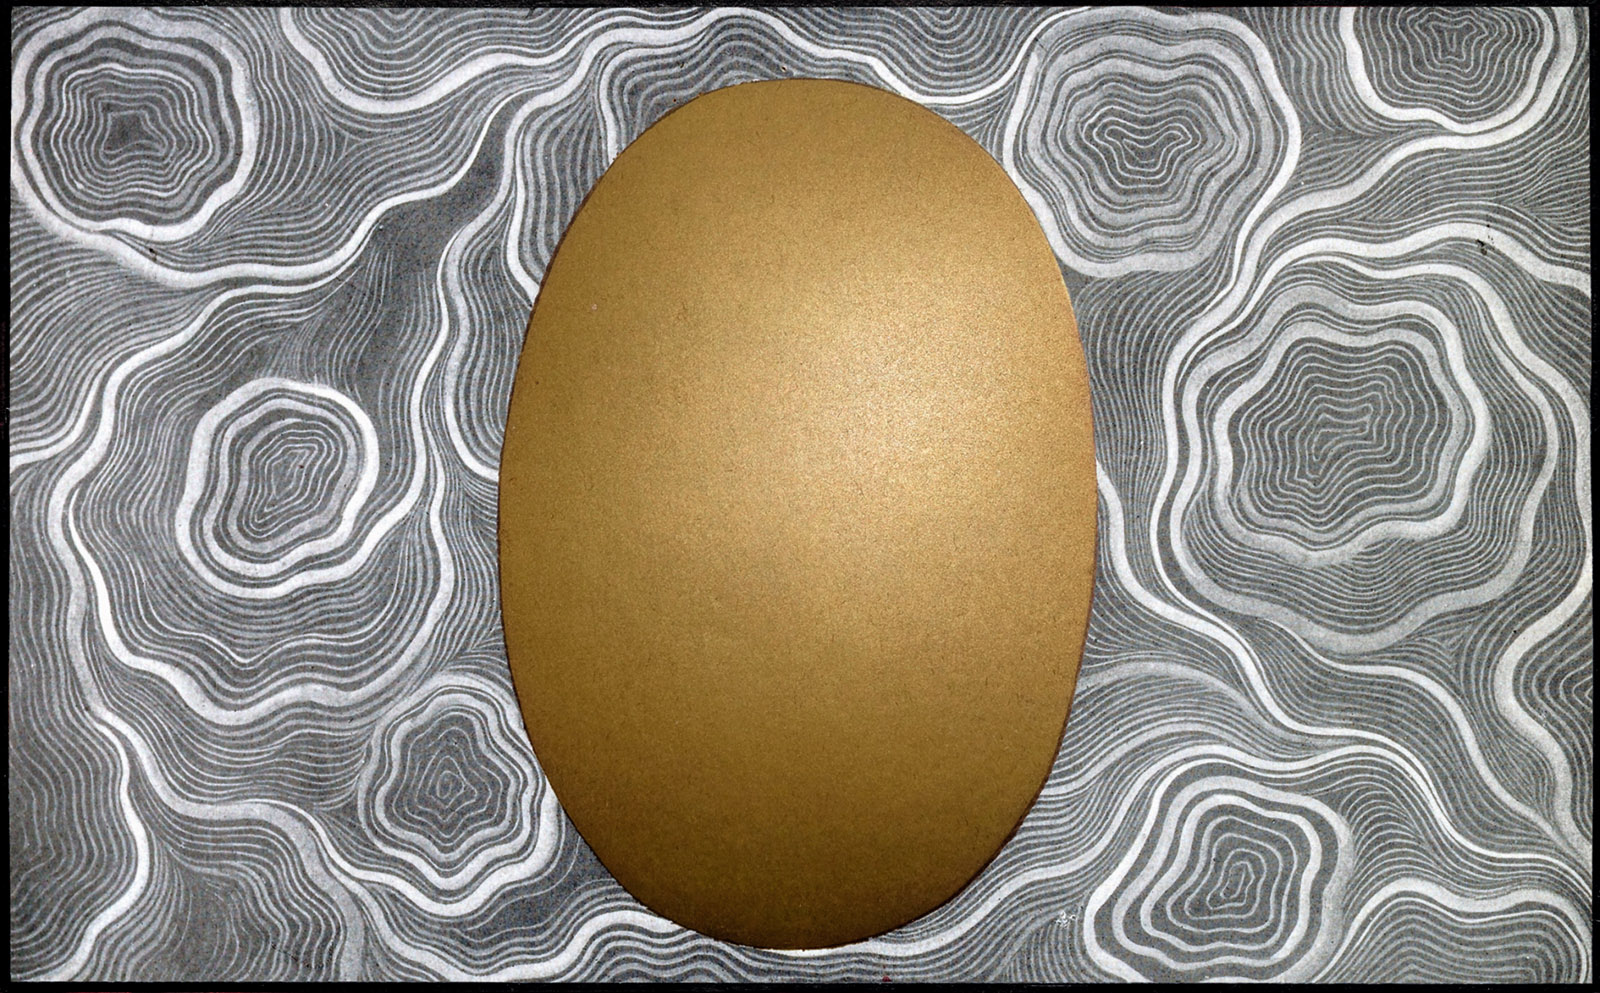 Hiranyagarbha, the 'golden womb' or cosmic egg; painting by Manaku